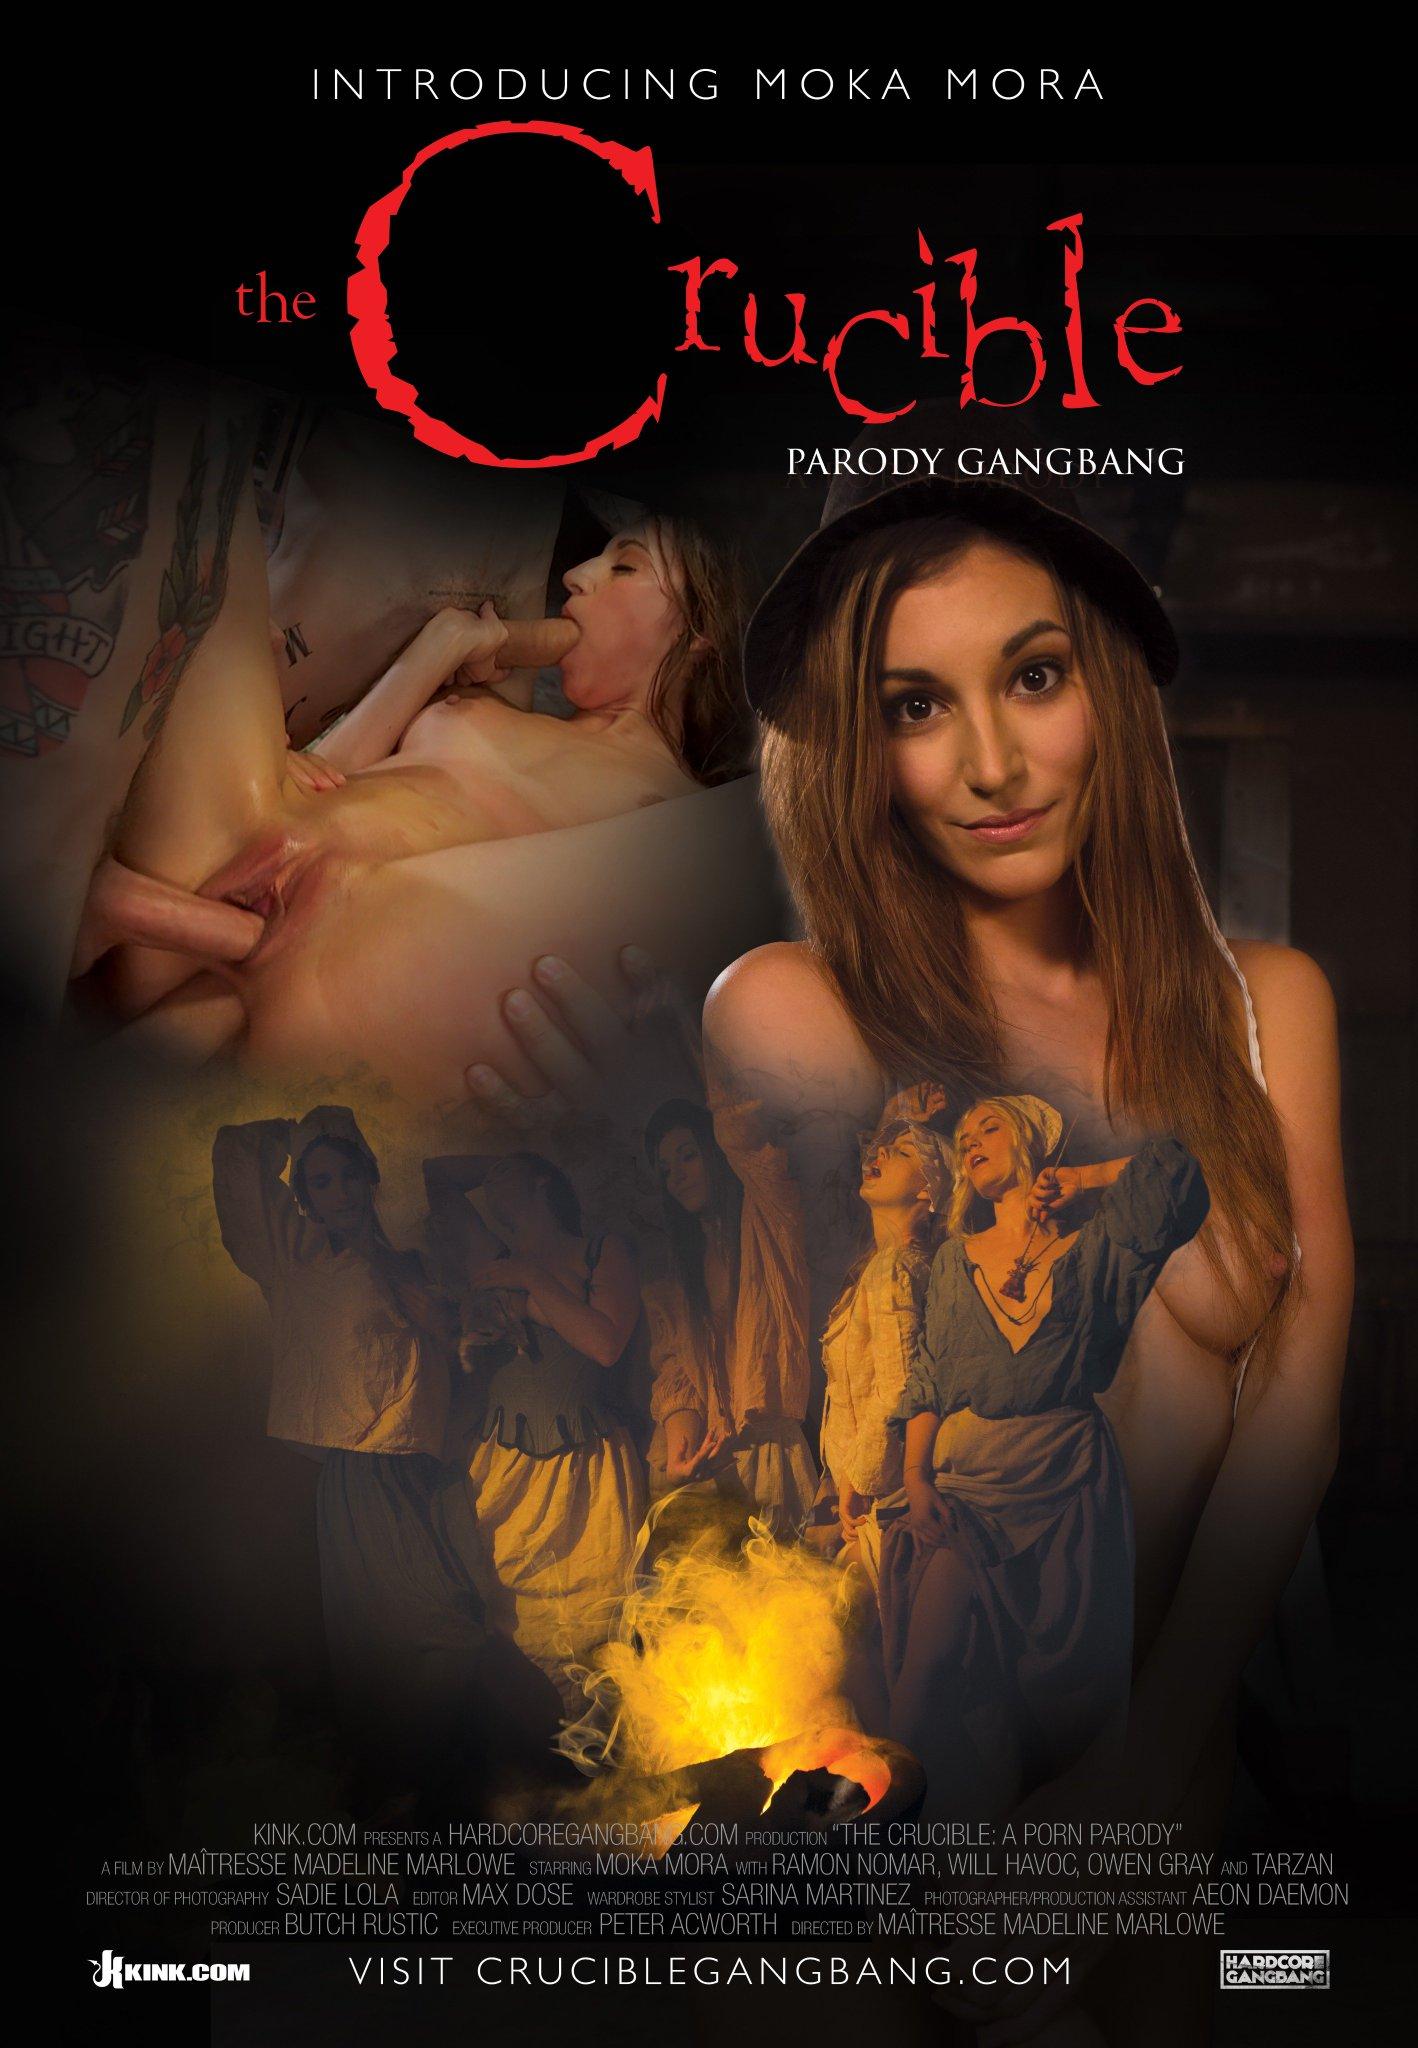 The crucible porn parody random photo gallery